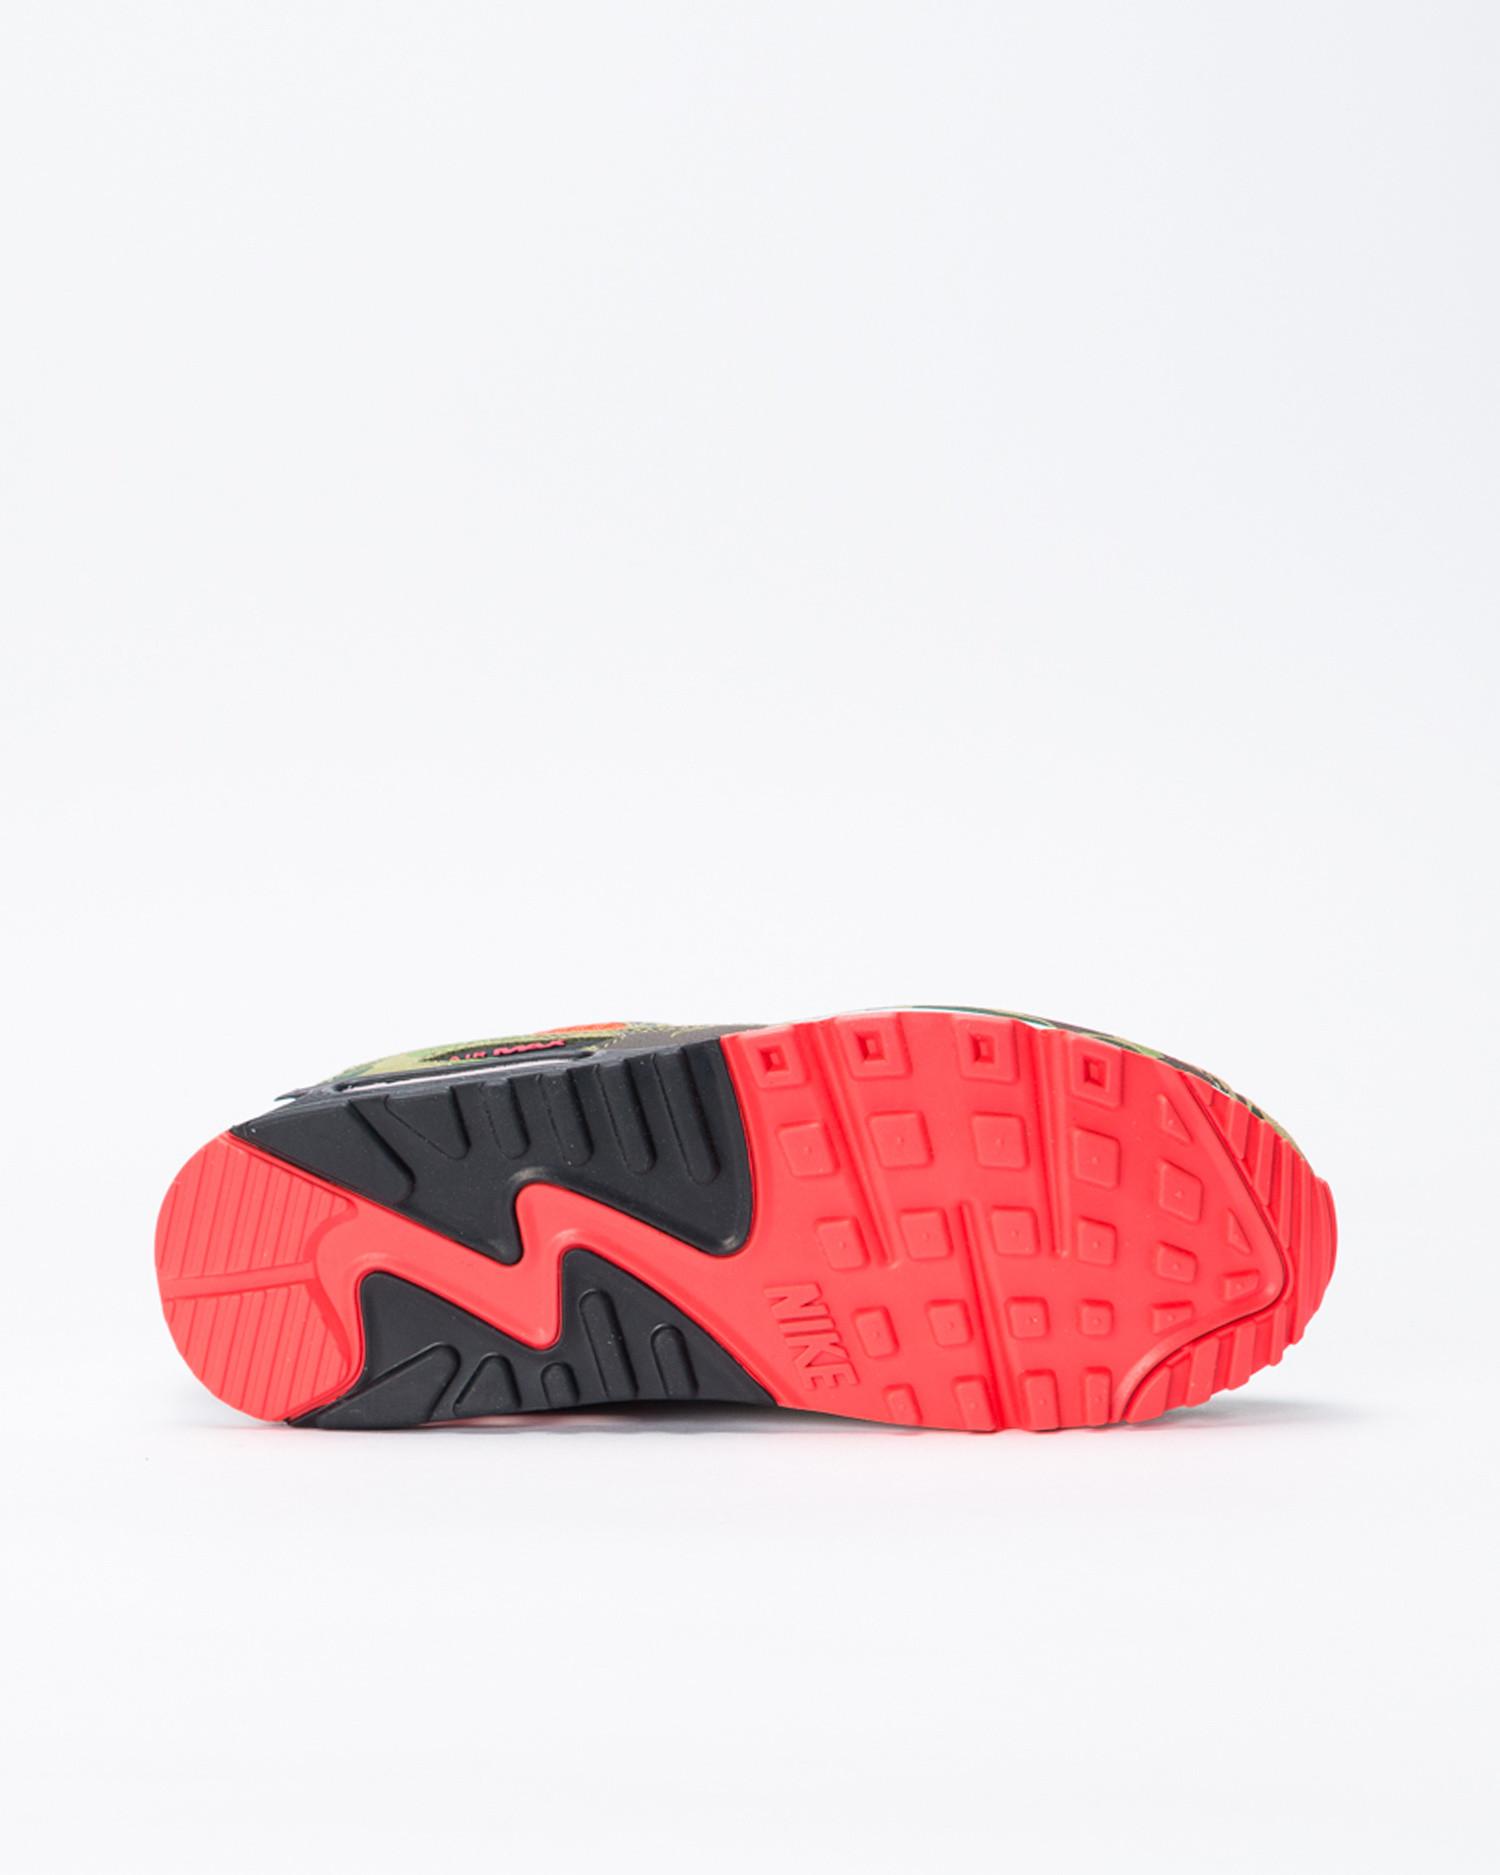 Nike Air Max 90 SP Reverse Duck Camo Infrared/Black